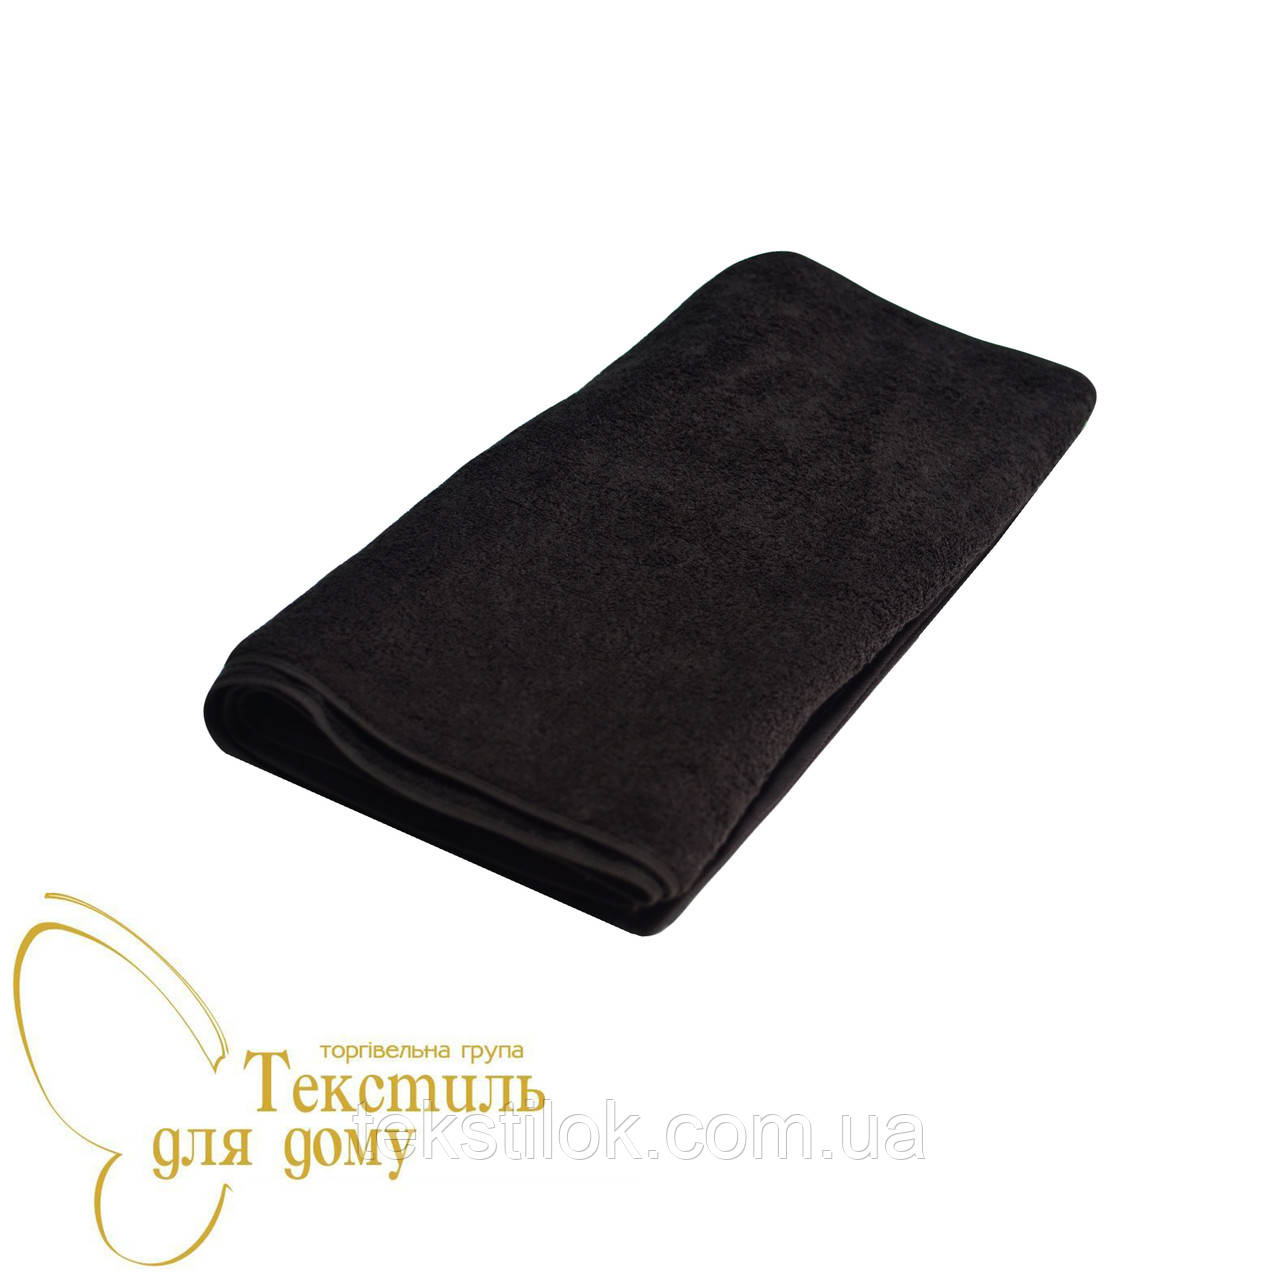 Полотенце лицевое 50*100, 500 гр/м2, 16/1, горький шоколад